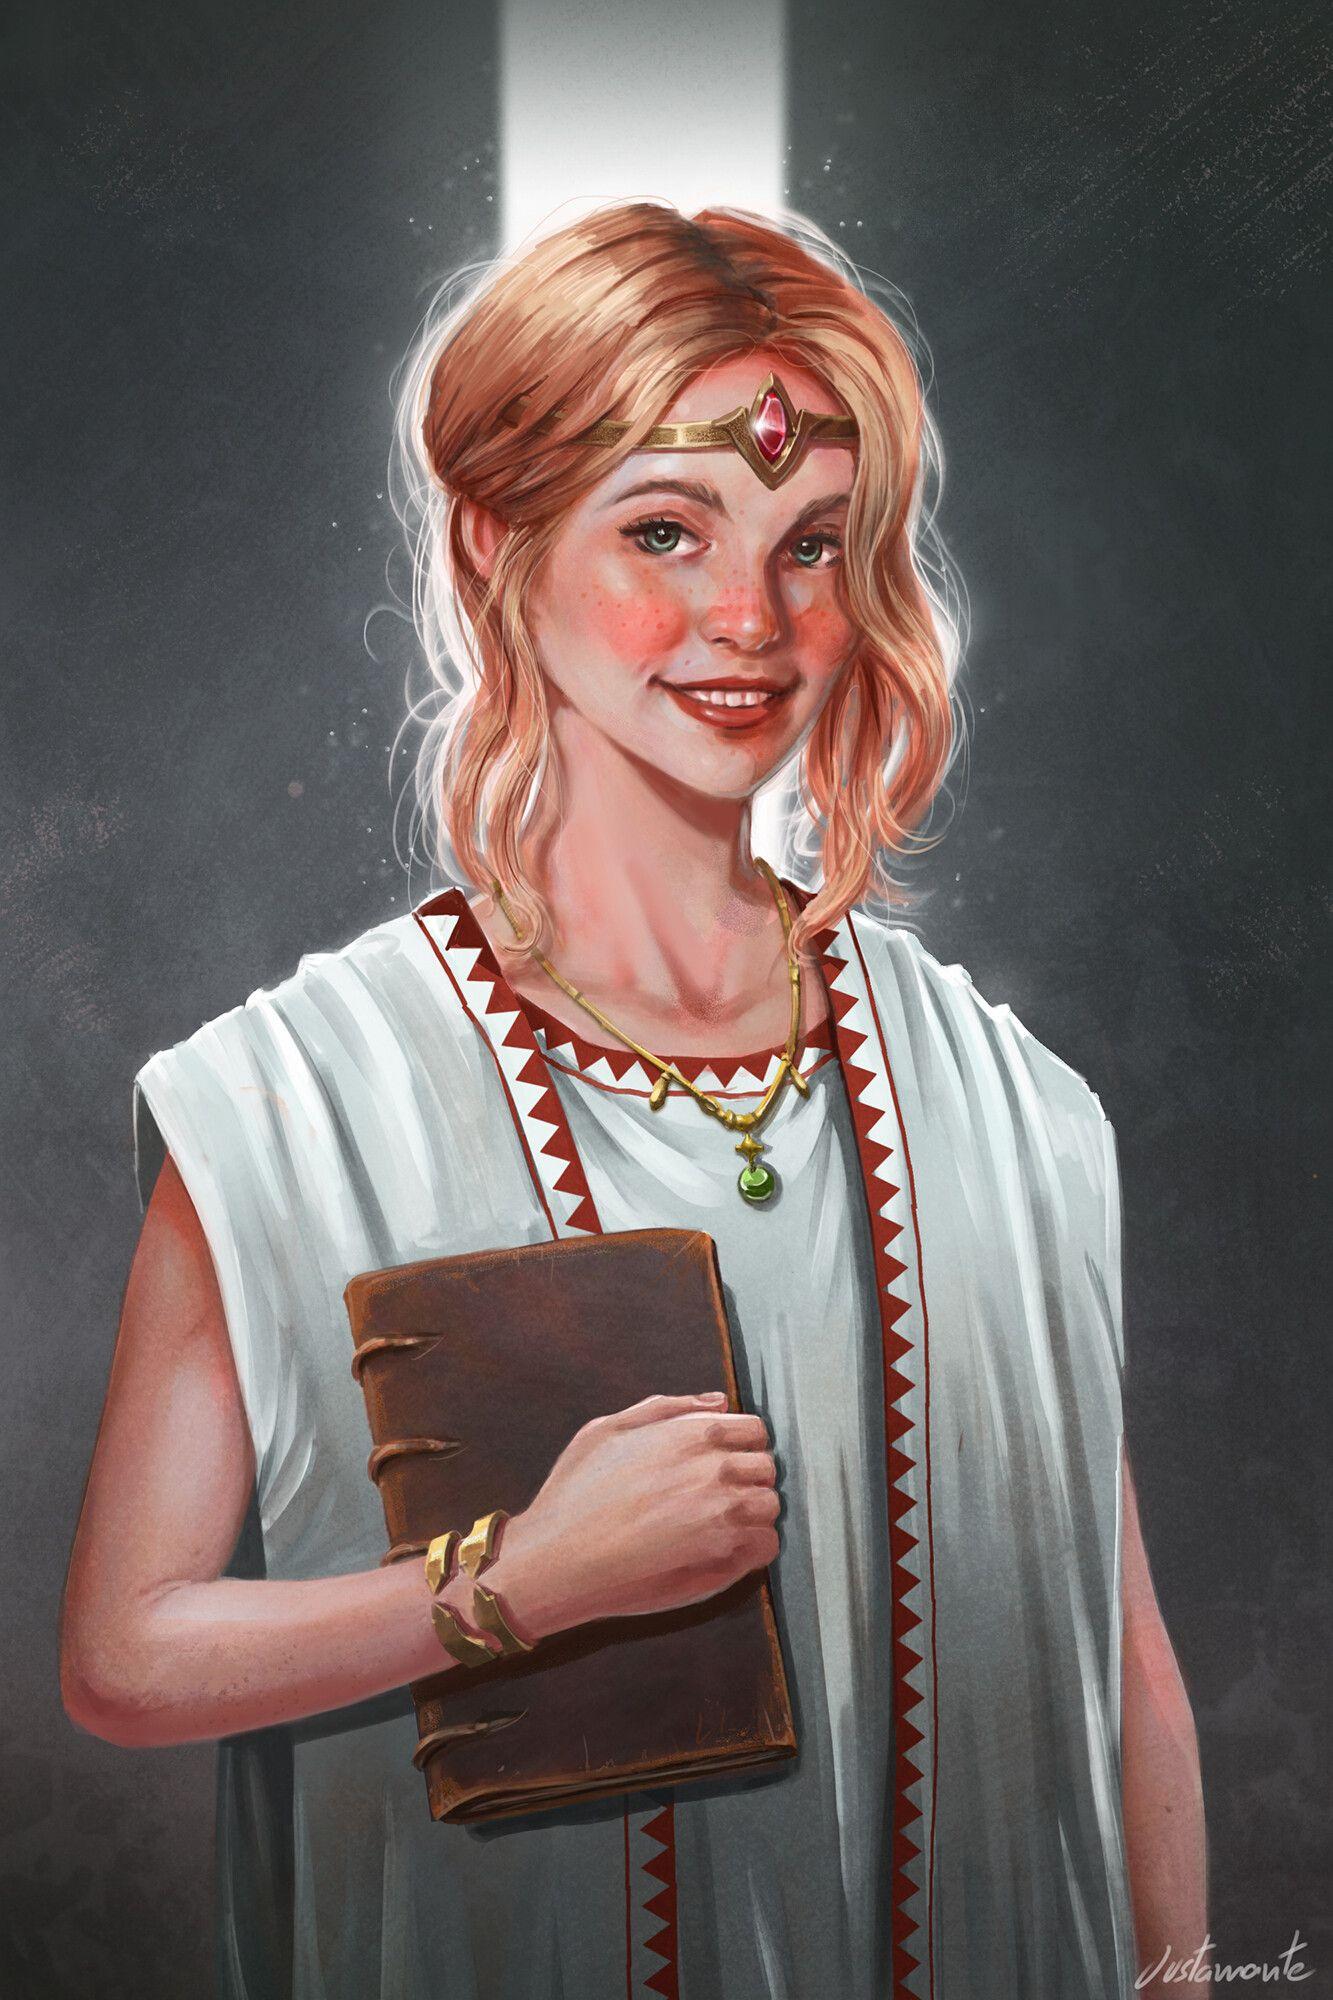 Sorella, apprentie prêtresse 650144cfea656970b604b4dd743ab69c